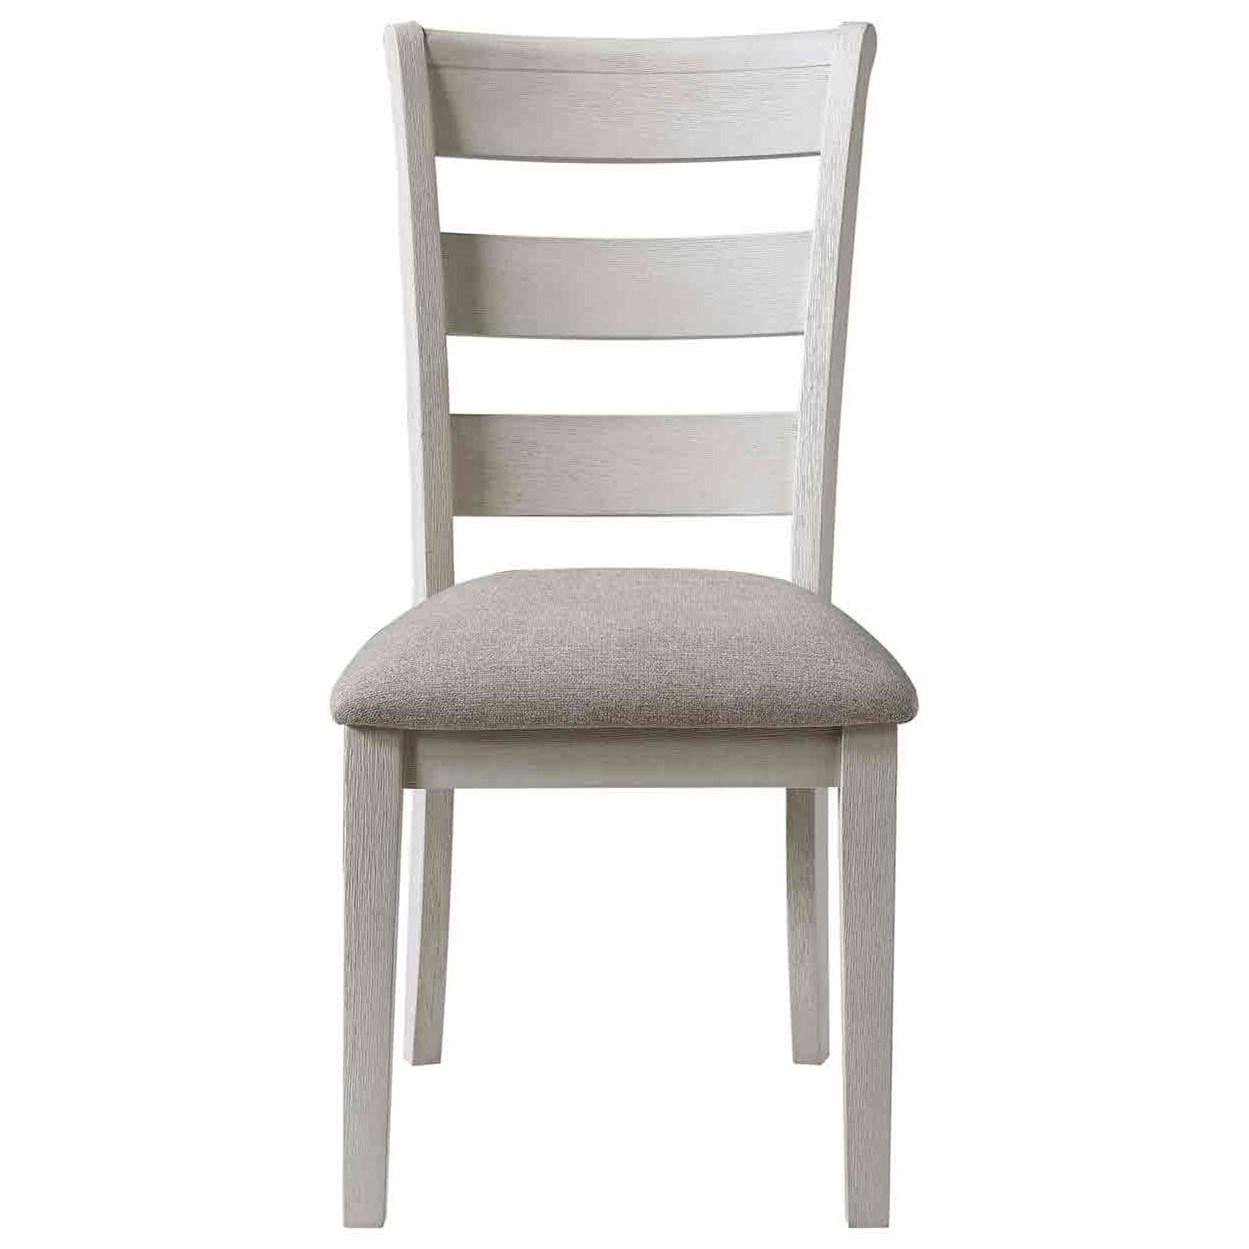 Modern Farmhouse Upholstered Ladderback Side Chair